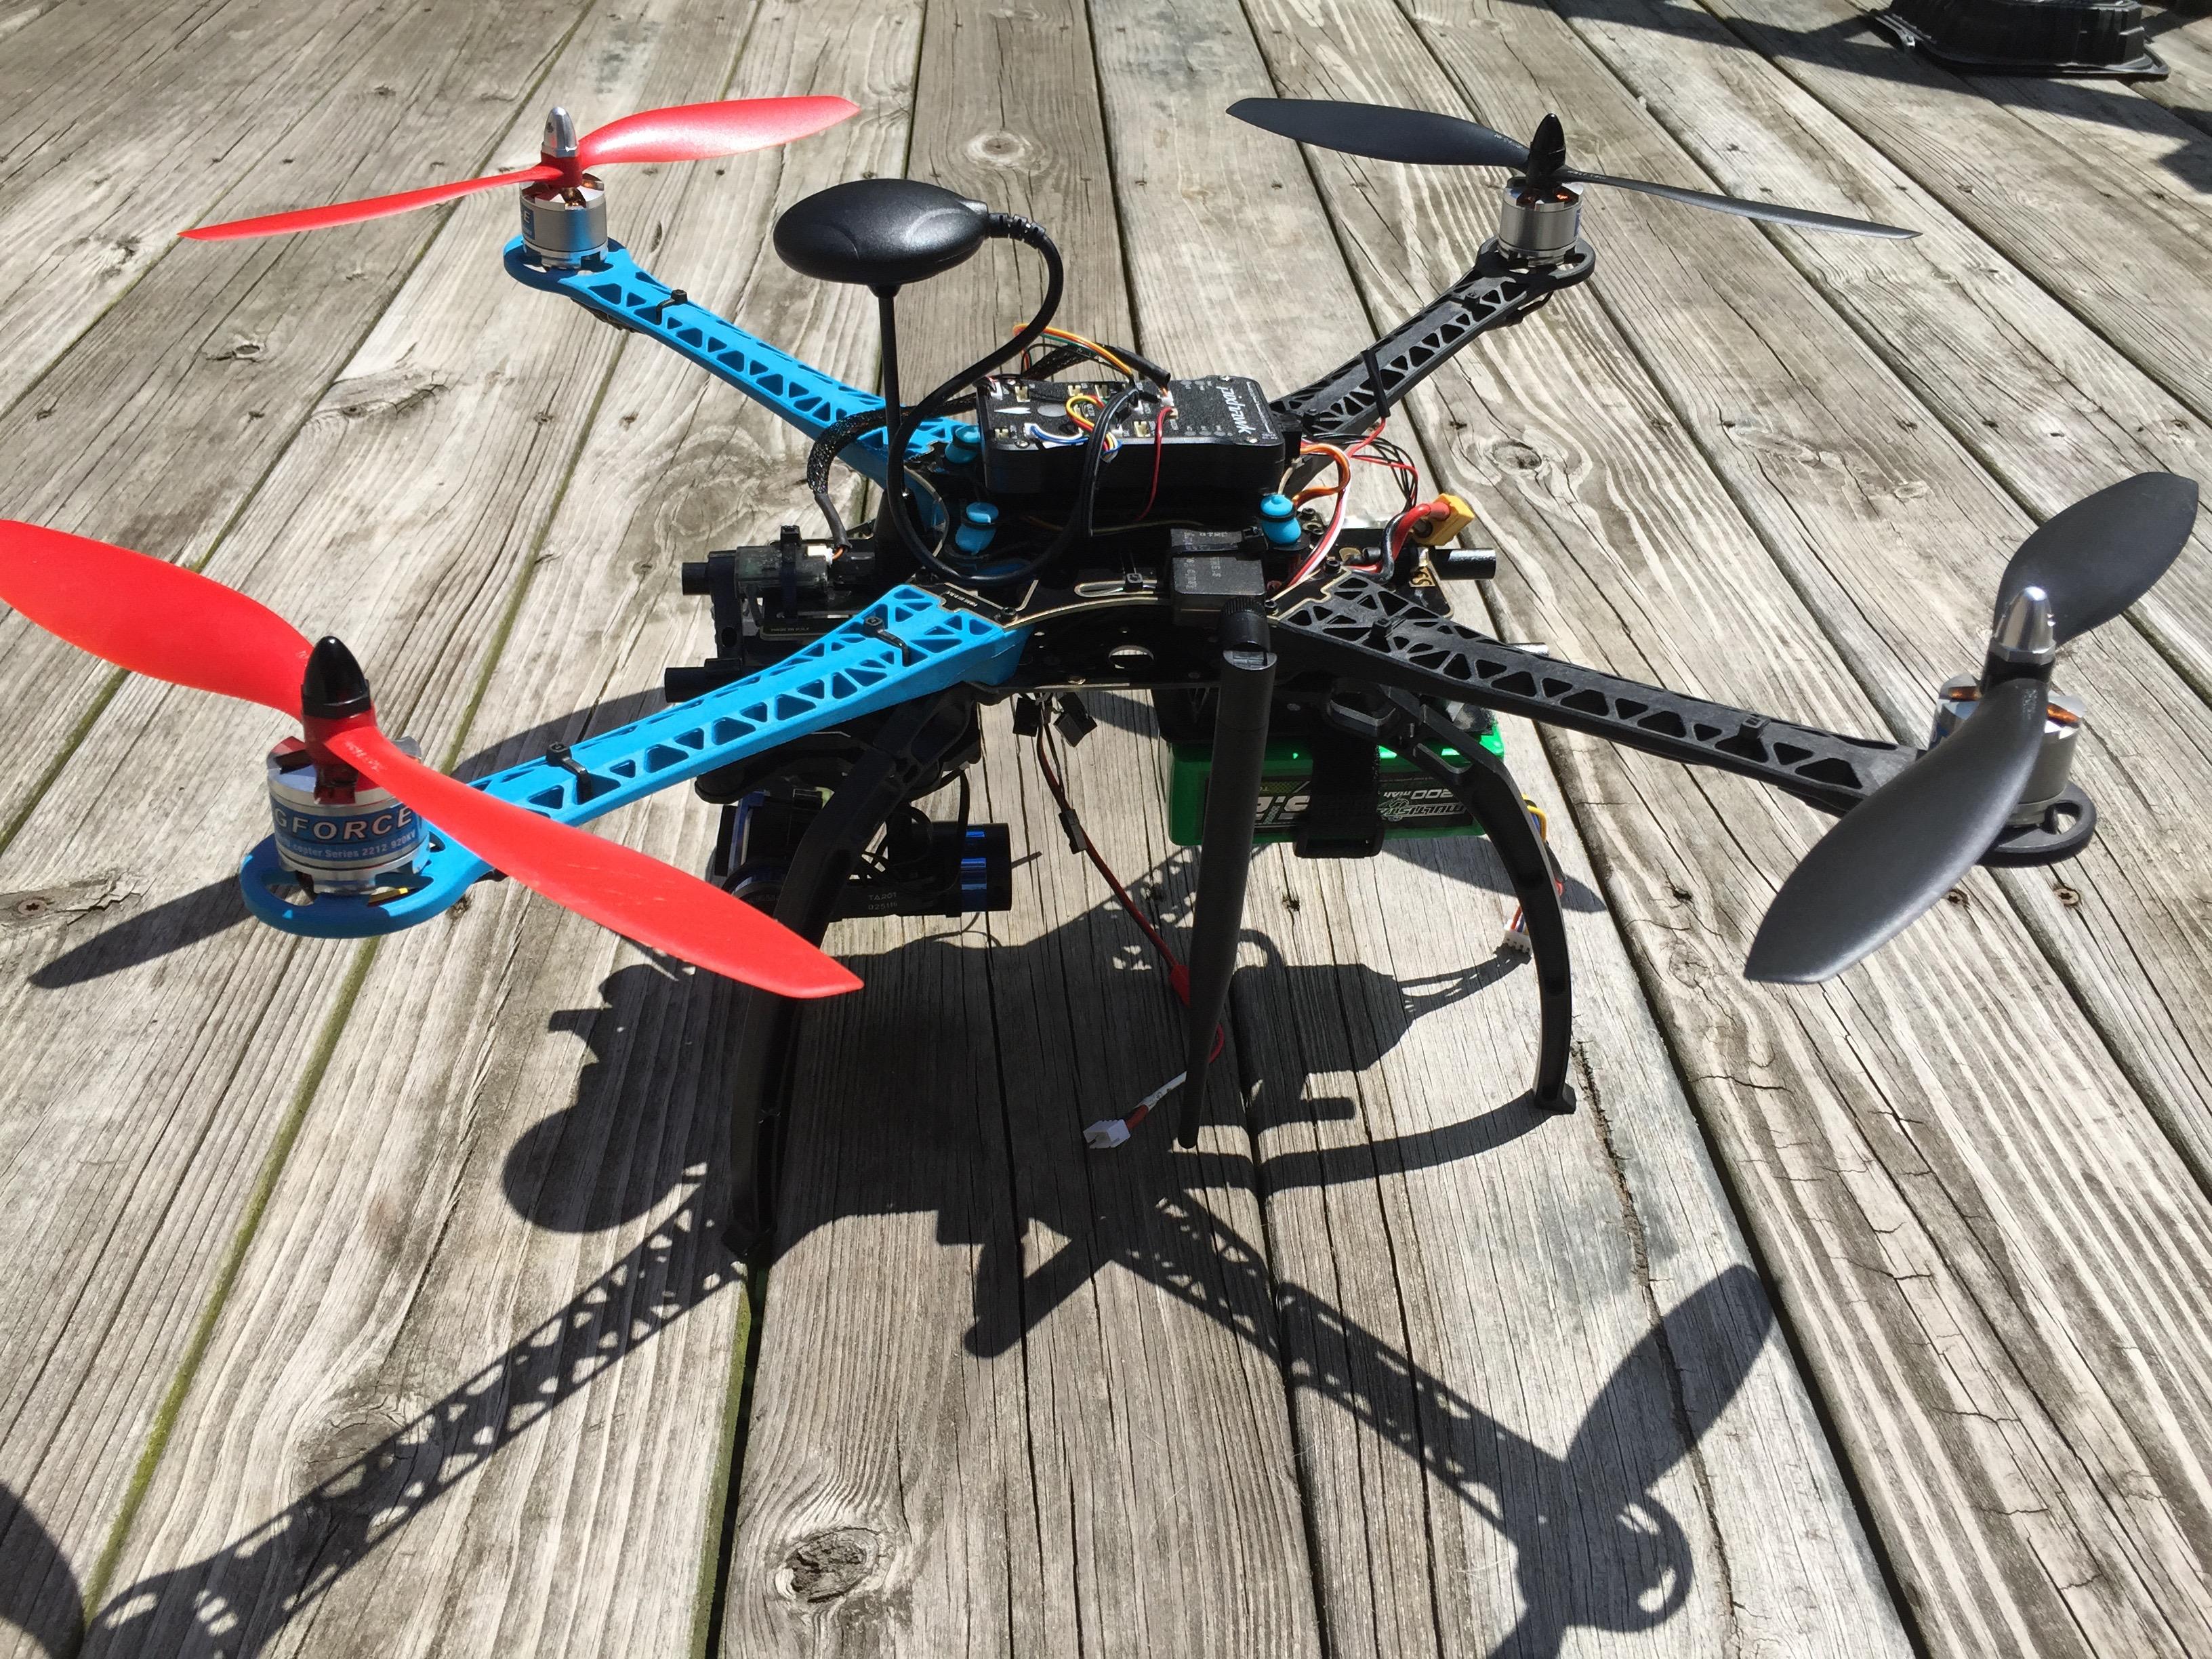 S500 Gl Fiber Quadcopter Frame 480mm - Integrated PCB Version Hobbyking Quadcopter Wiring Diagram on